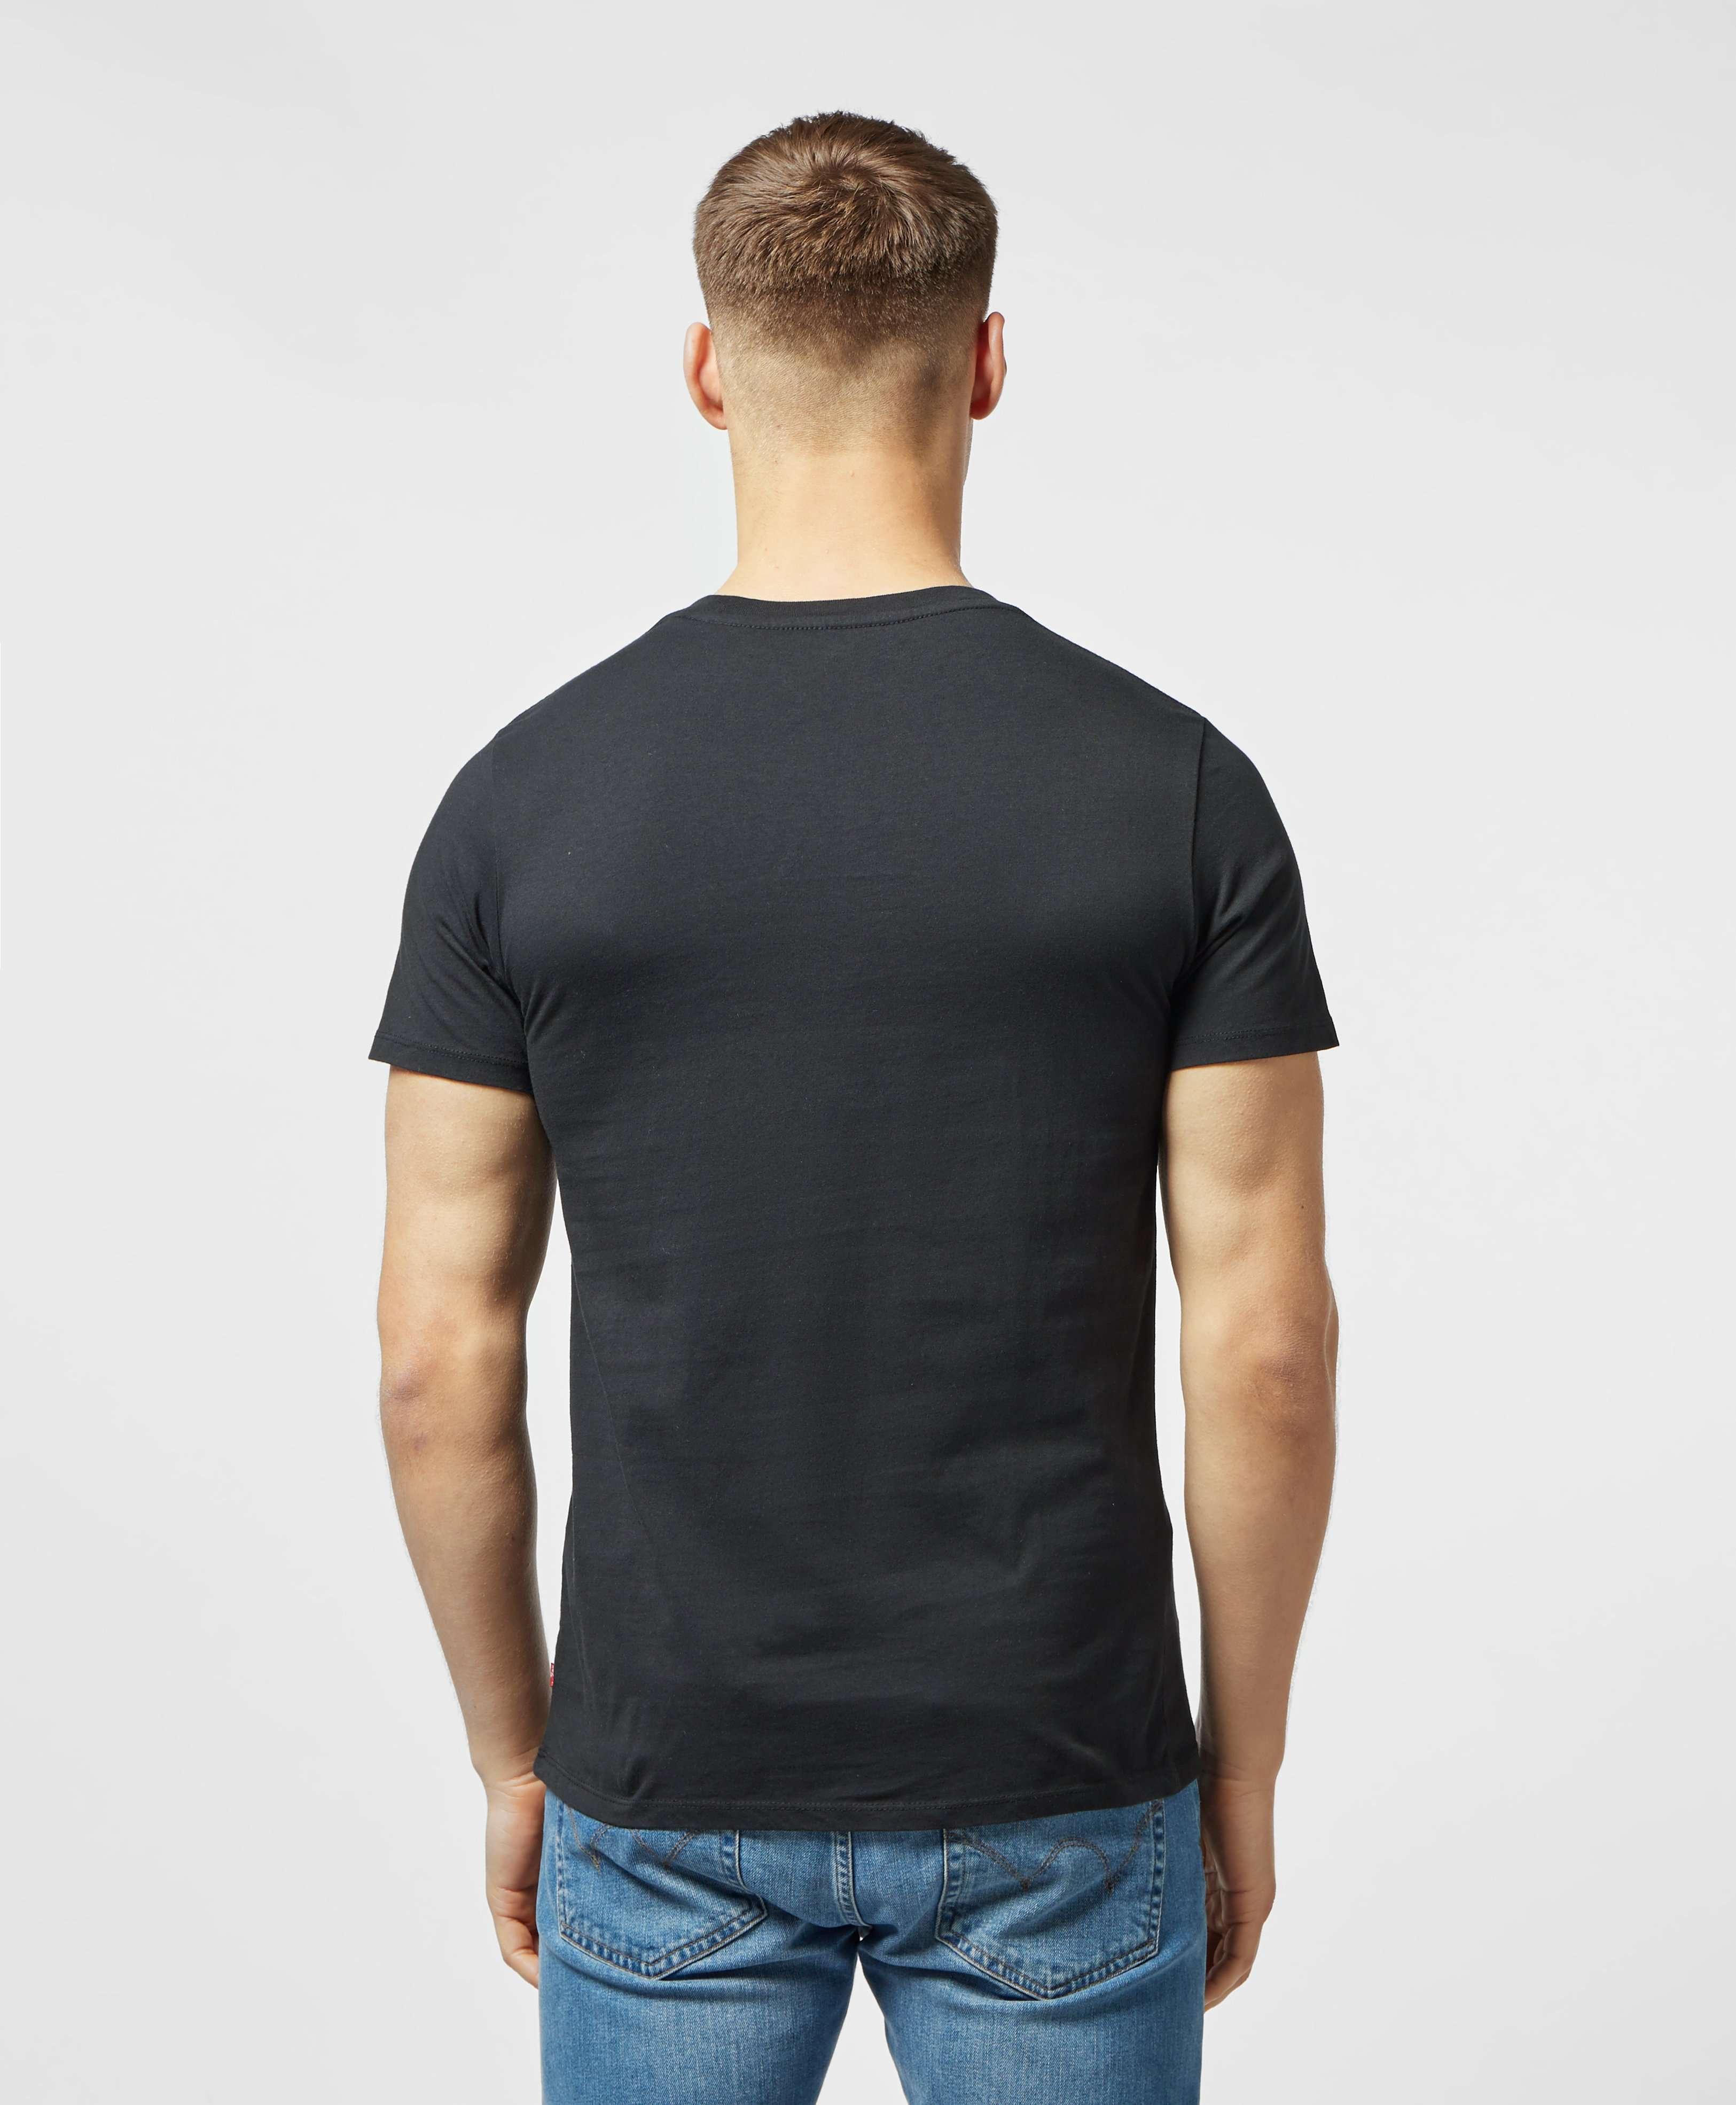 Levis Palm Graphic Short Sleeve T-Shirt